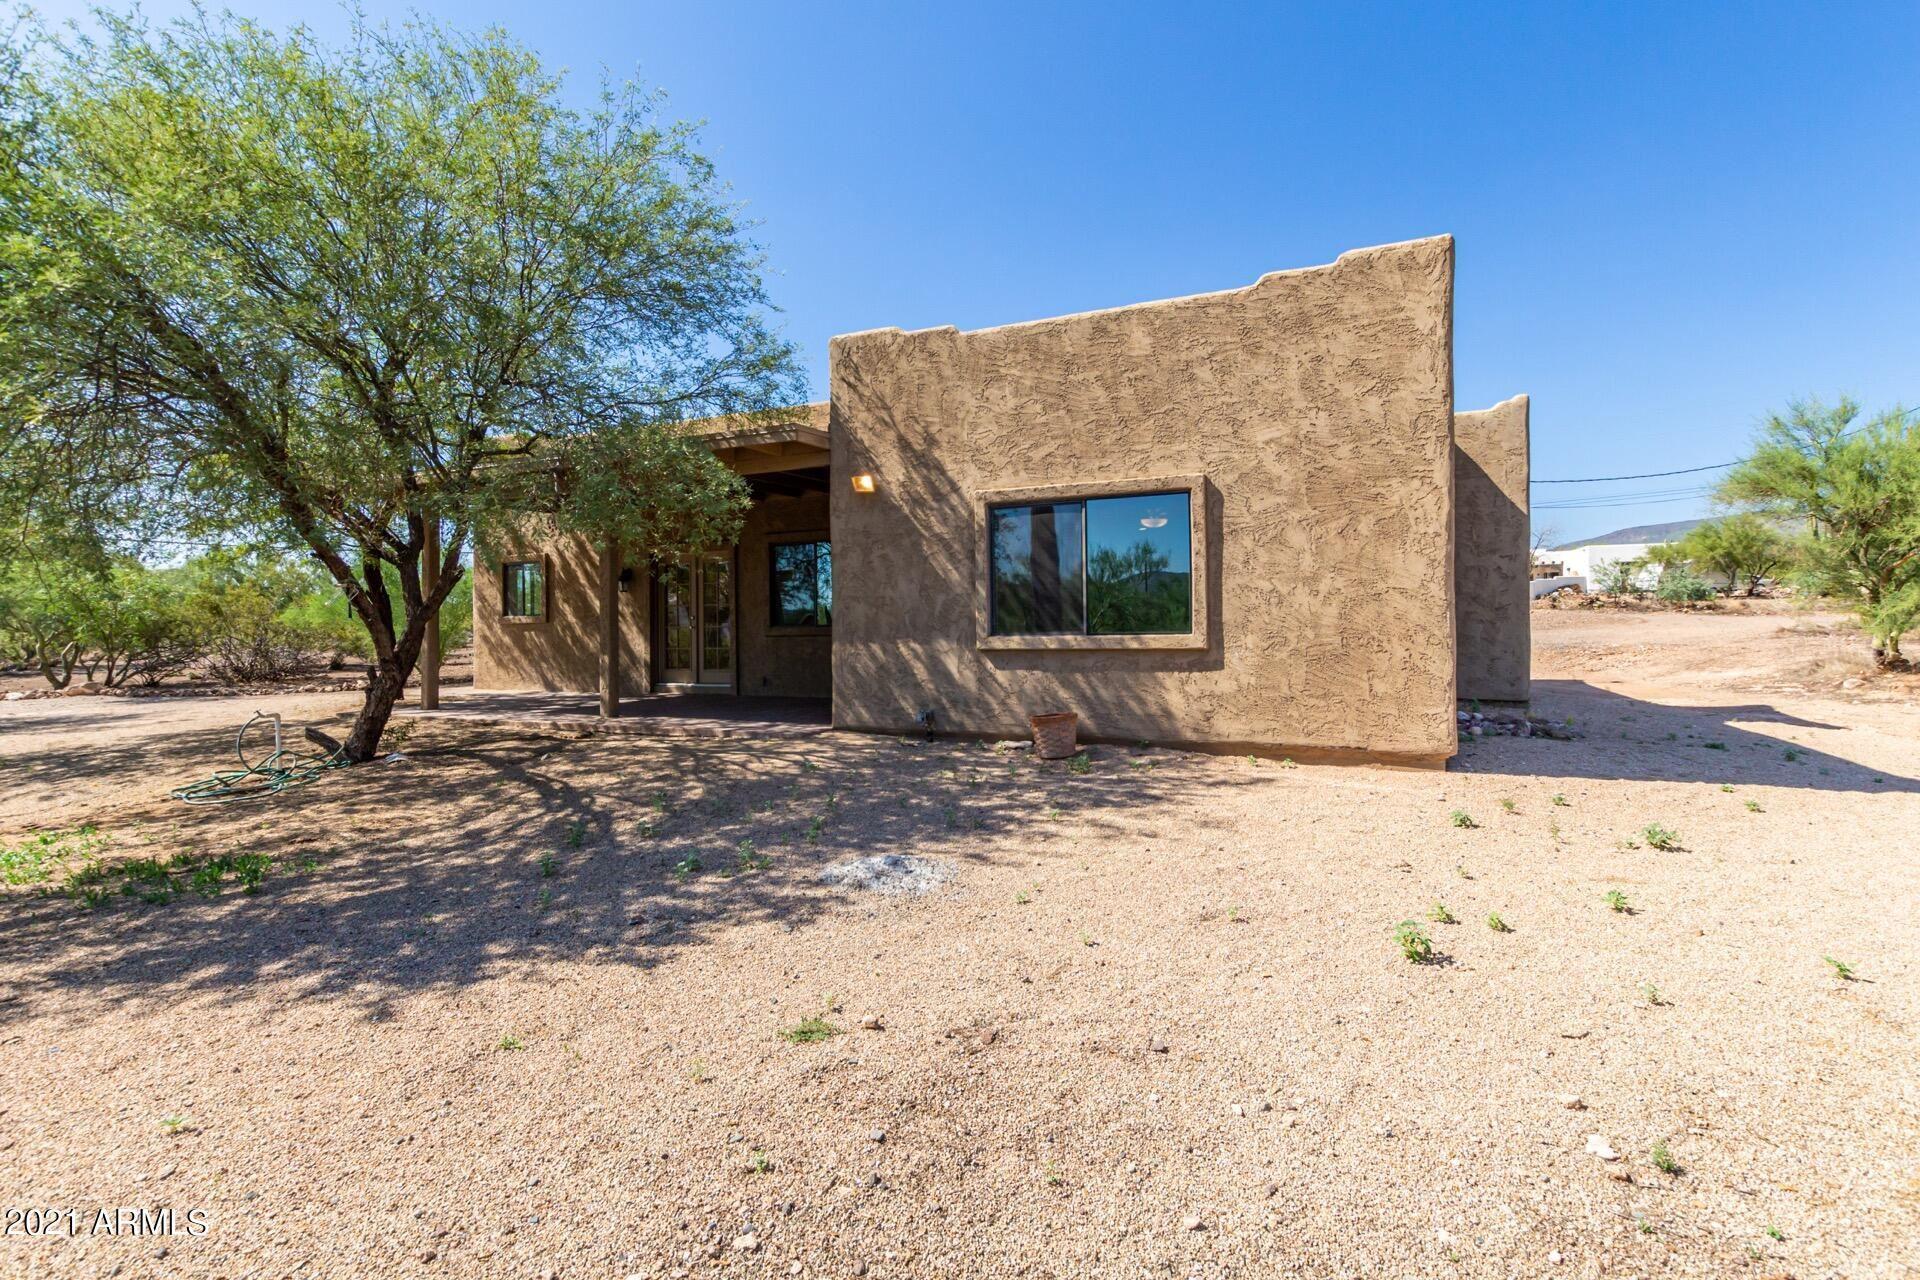 Photo of 44805 N 20TH Street, New River, AZ 85087 (MLS # 6285336)